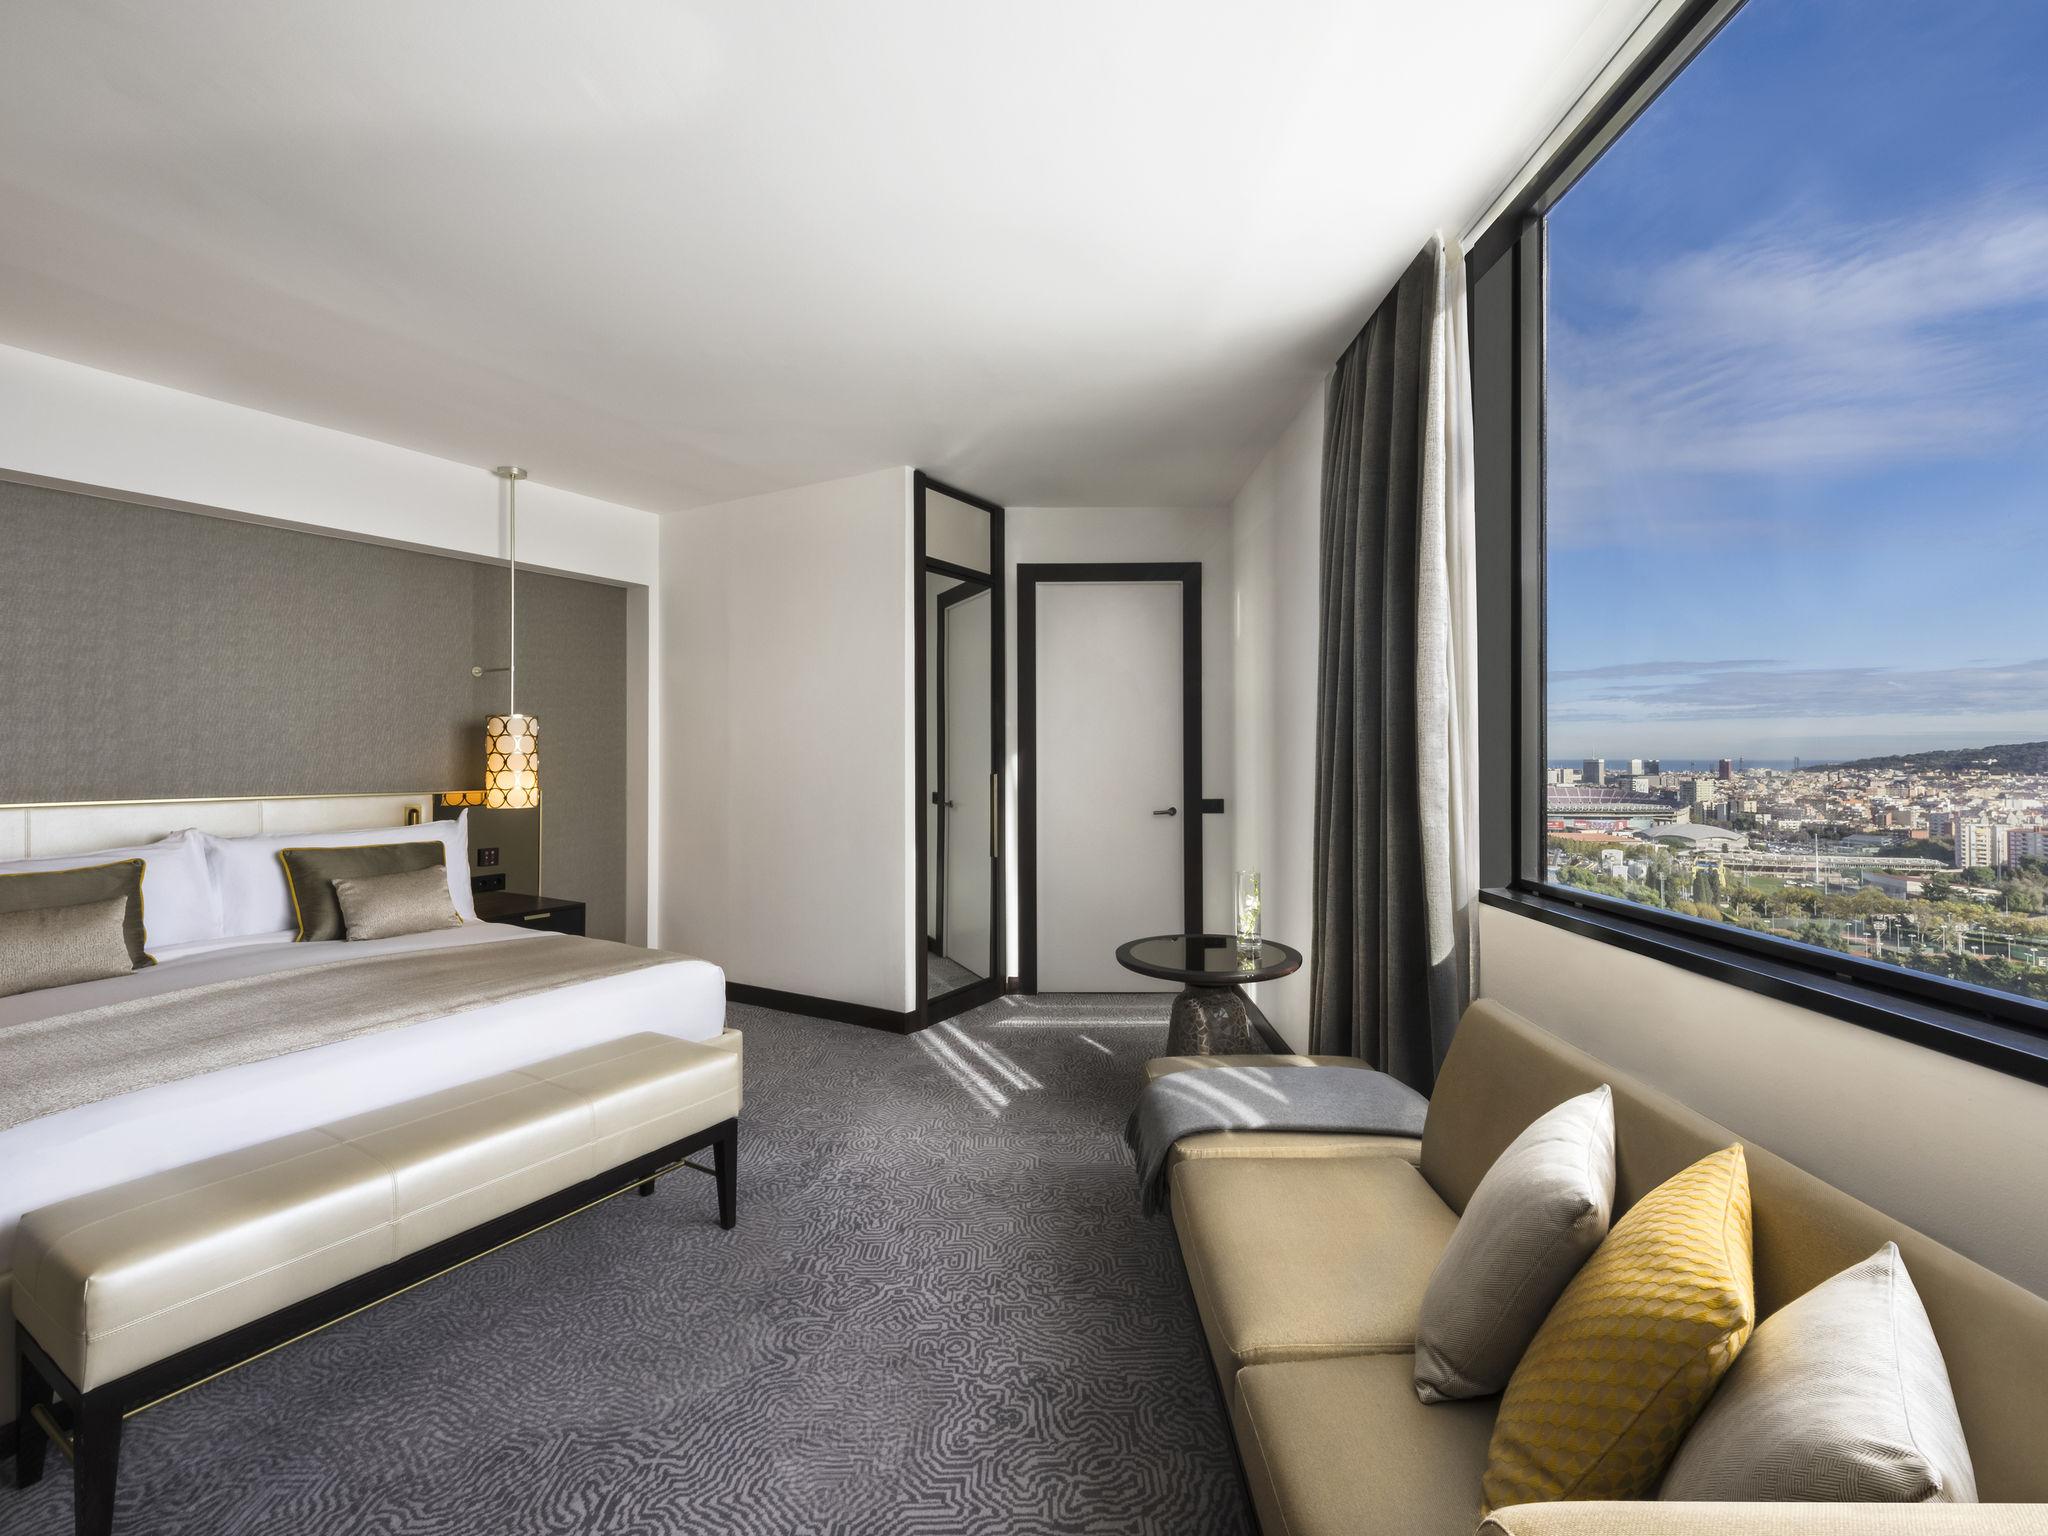 h tel barcelone fairmont rey juan carlos i barcelone. Black Bedroom Furniture Sets. Home Design Ideas